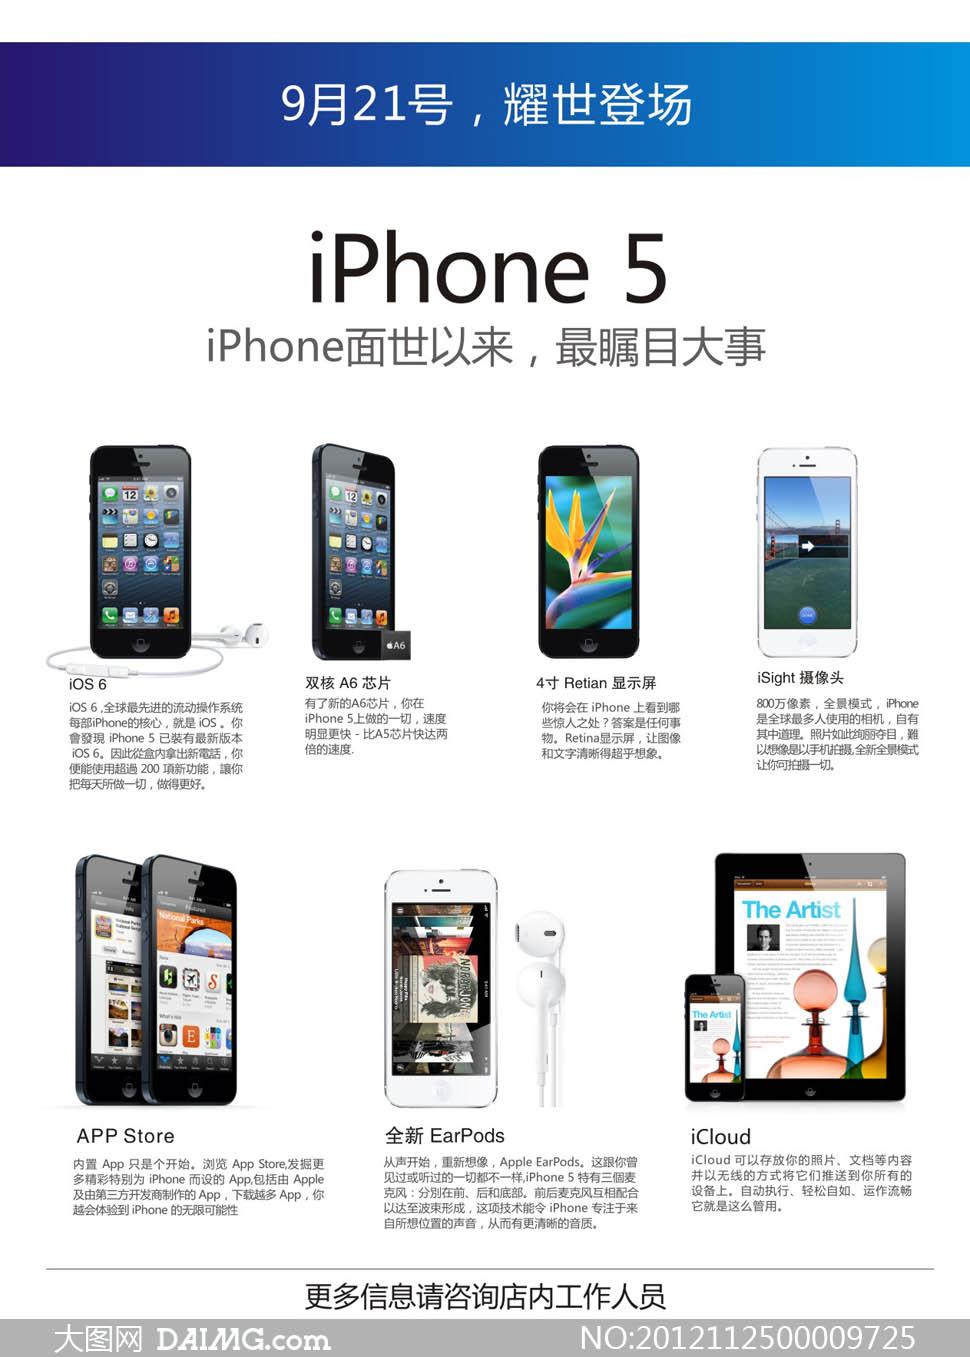 iphone5新功能介绍页面设计矢量素材